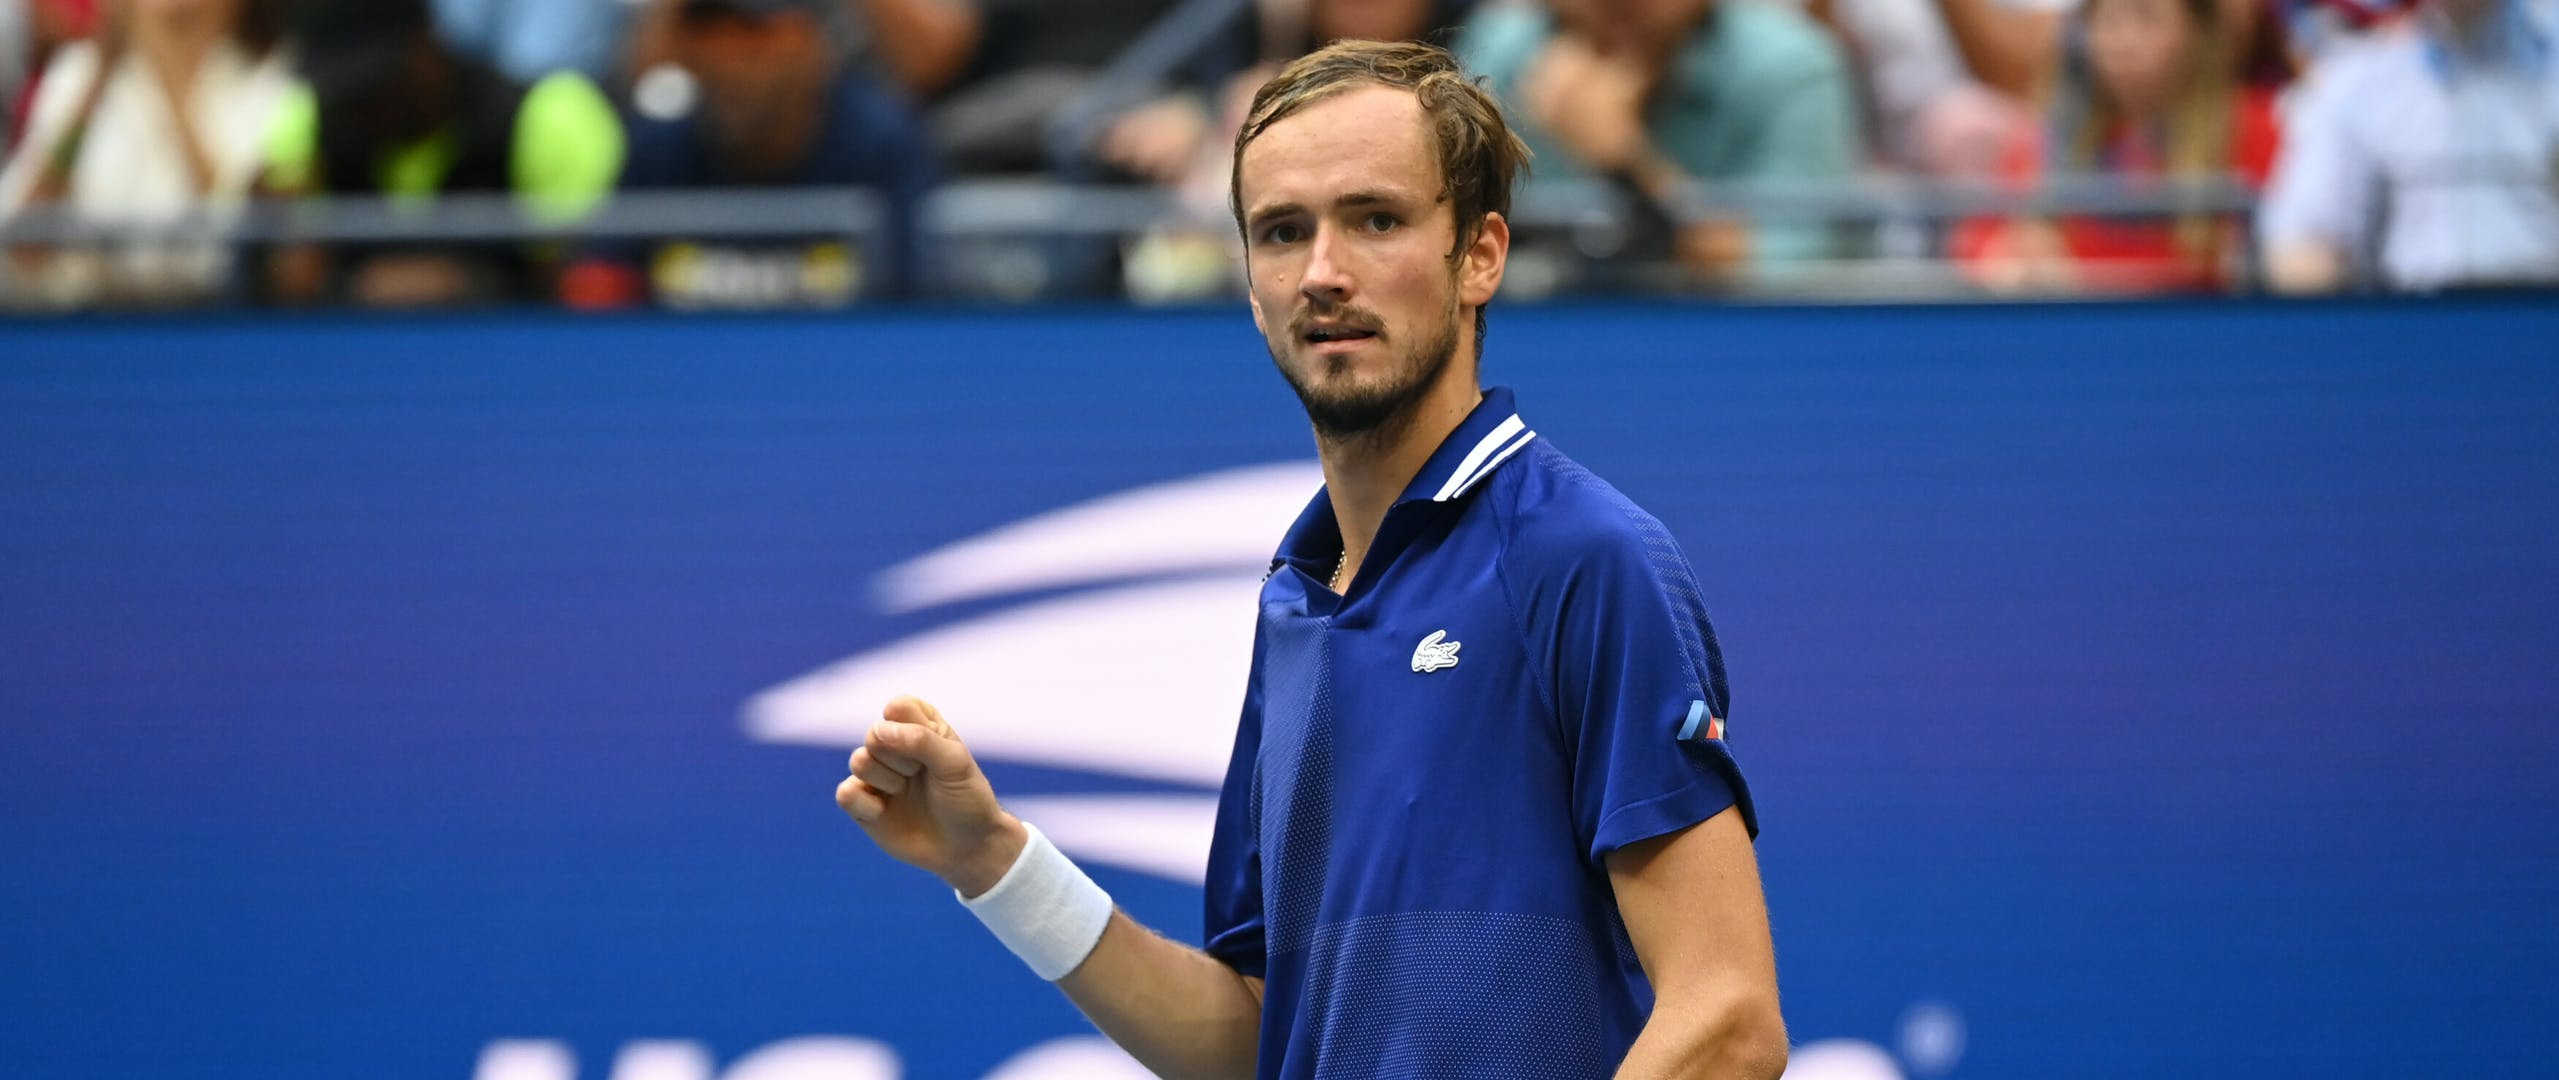 Daniil Medvedev US Open 2021